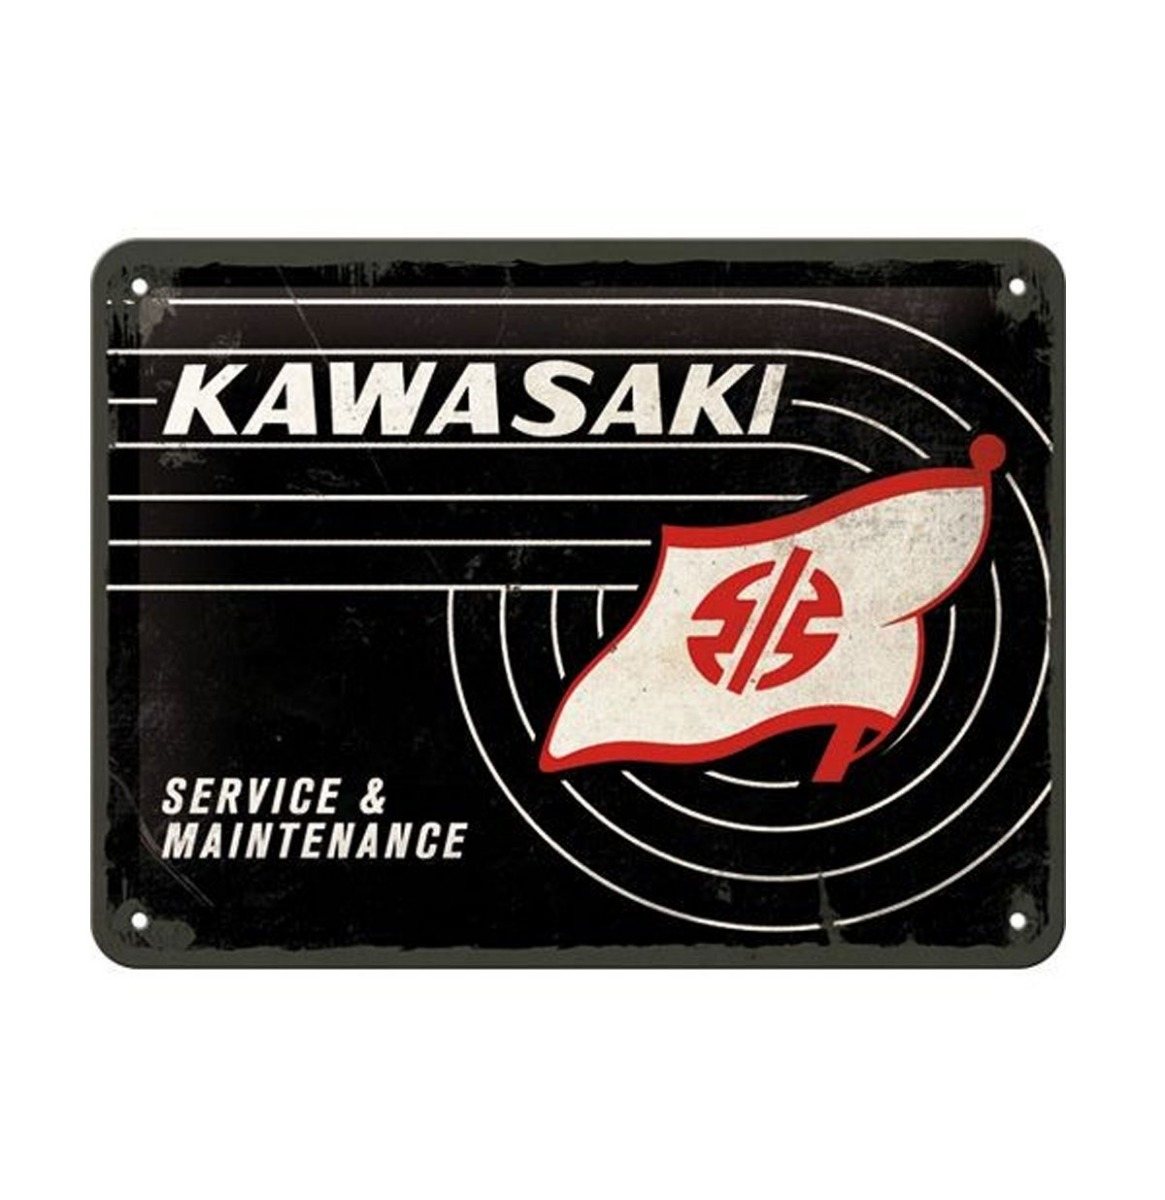 Kawasaki Service & Maintenence Metalen Bord Met Reliëf 15 x 20 cm